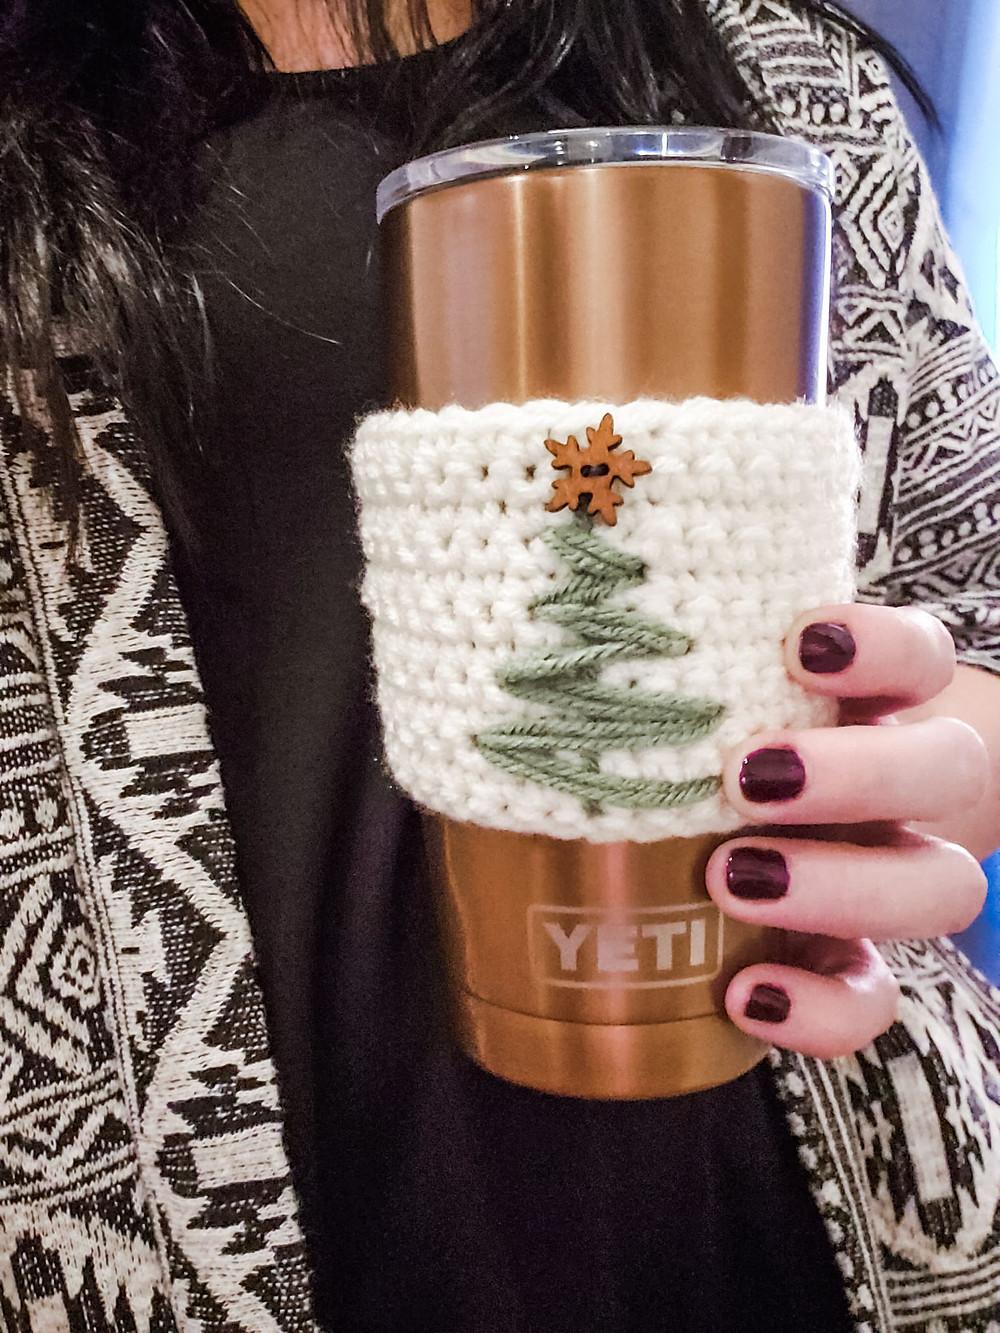 The Crochet Christmas Tree cozy in hand! It fits on my yeti mug.